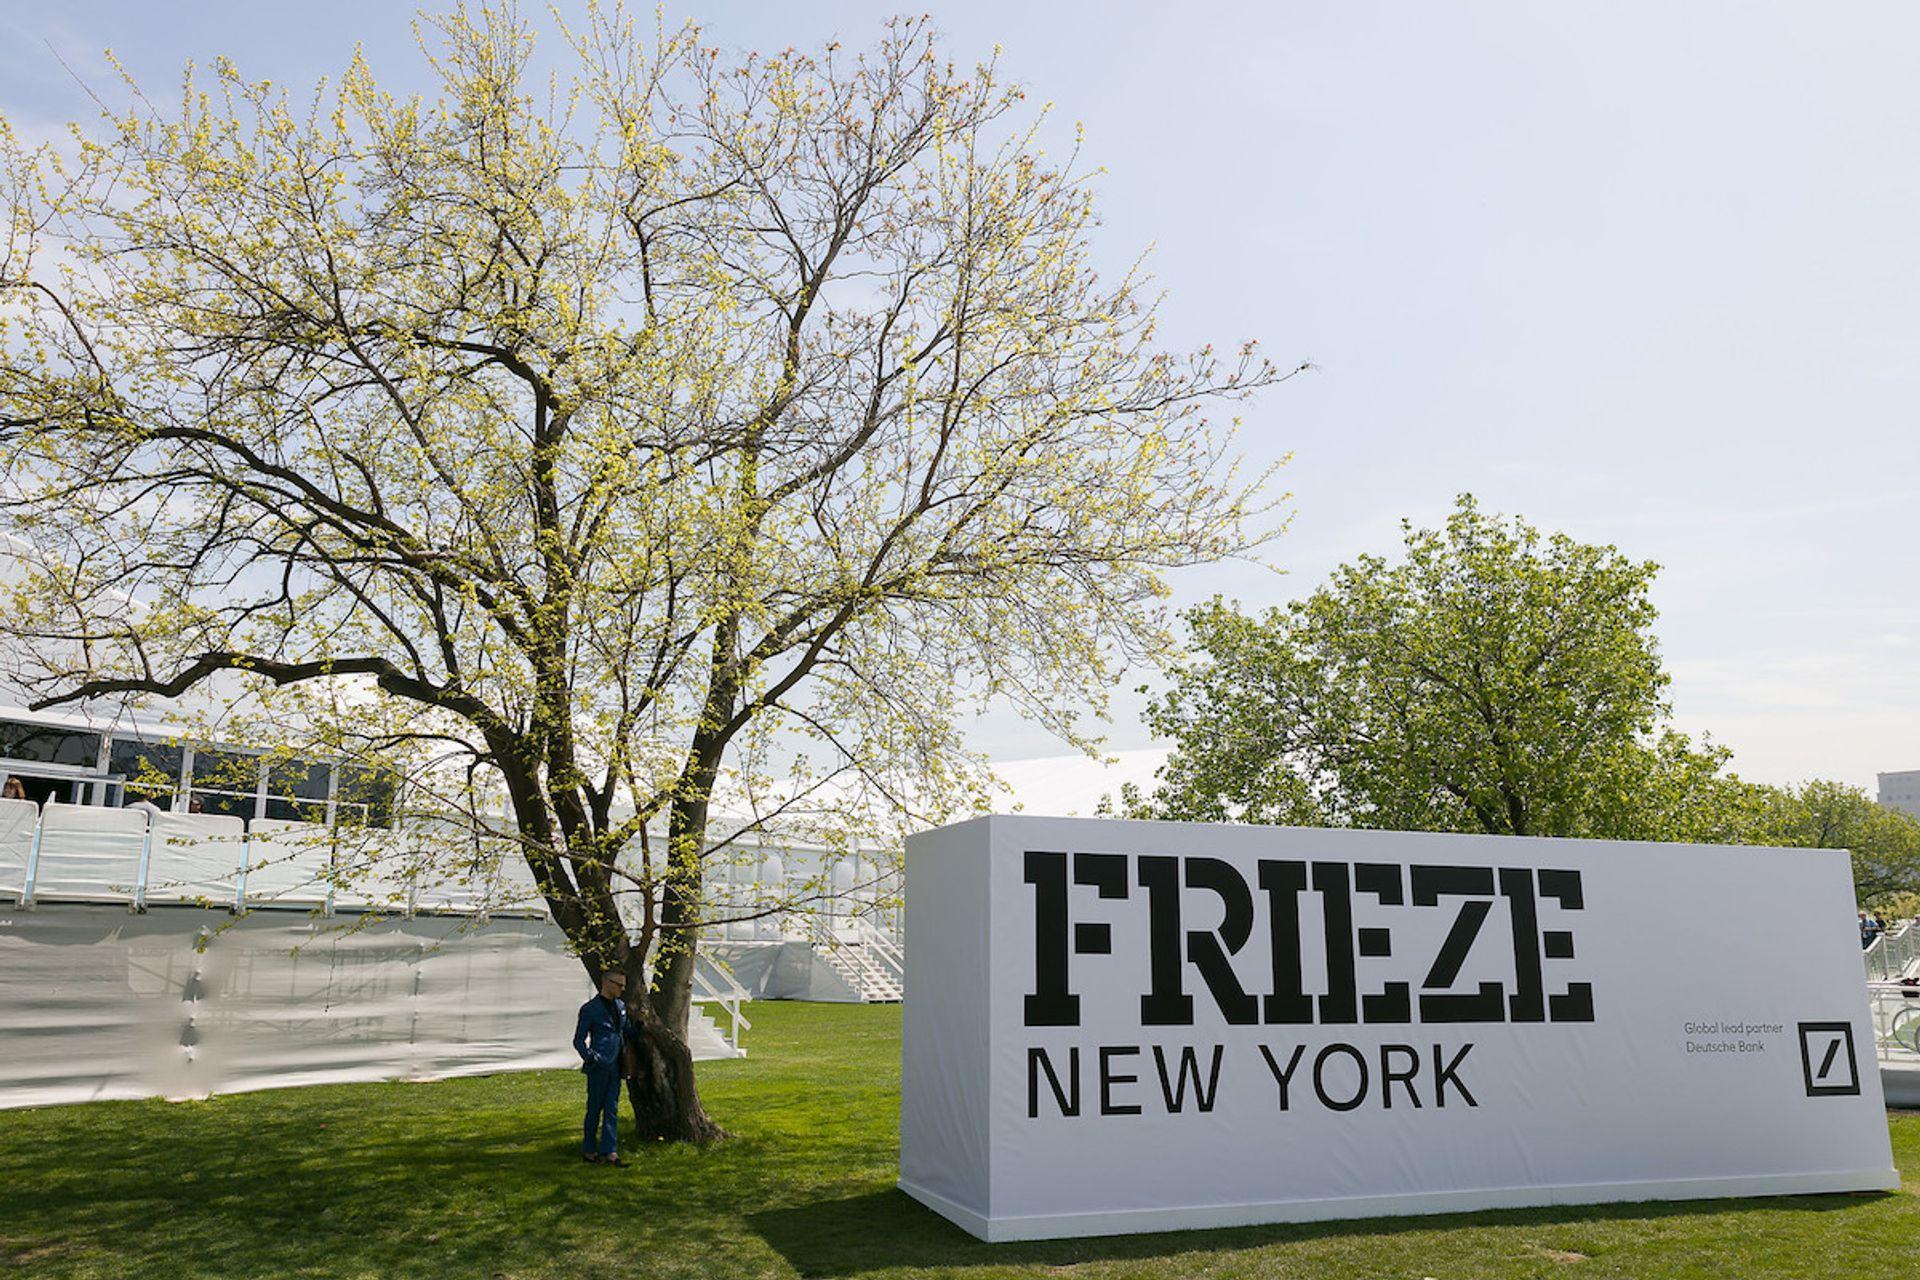 Frieze New York 2019. Courtesy of Mark Blower and Frieze.